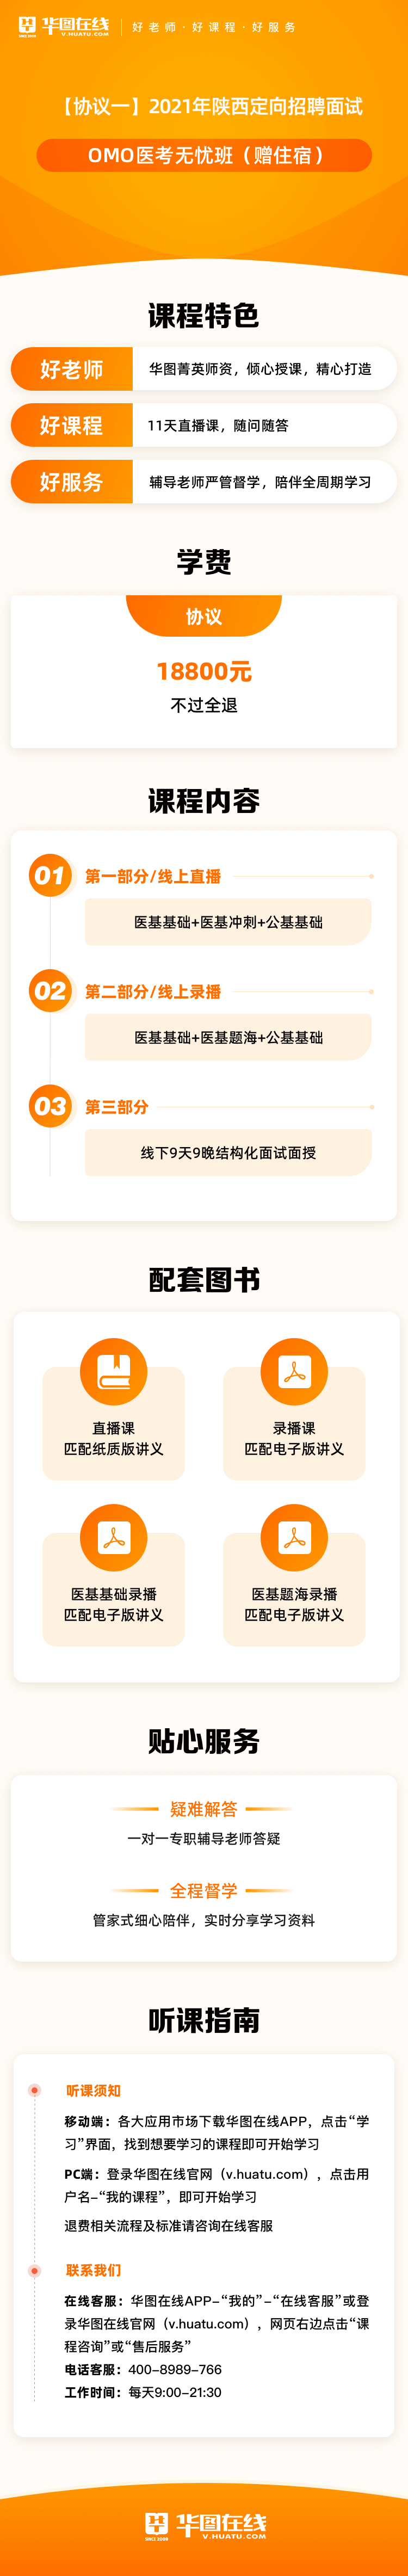 http://upload.htexam.com/userimg/1631873465.png